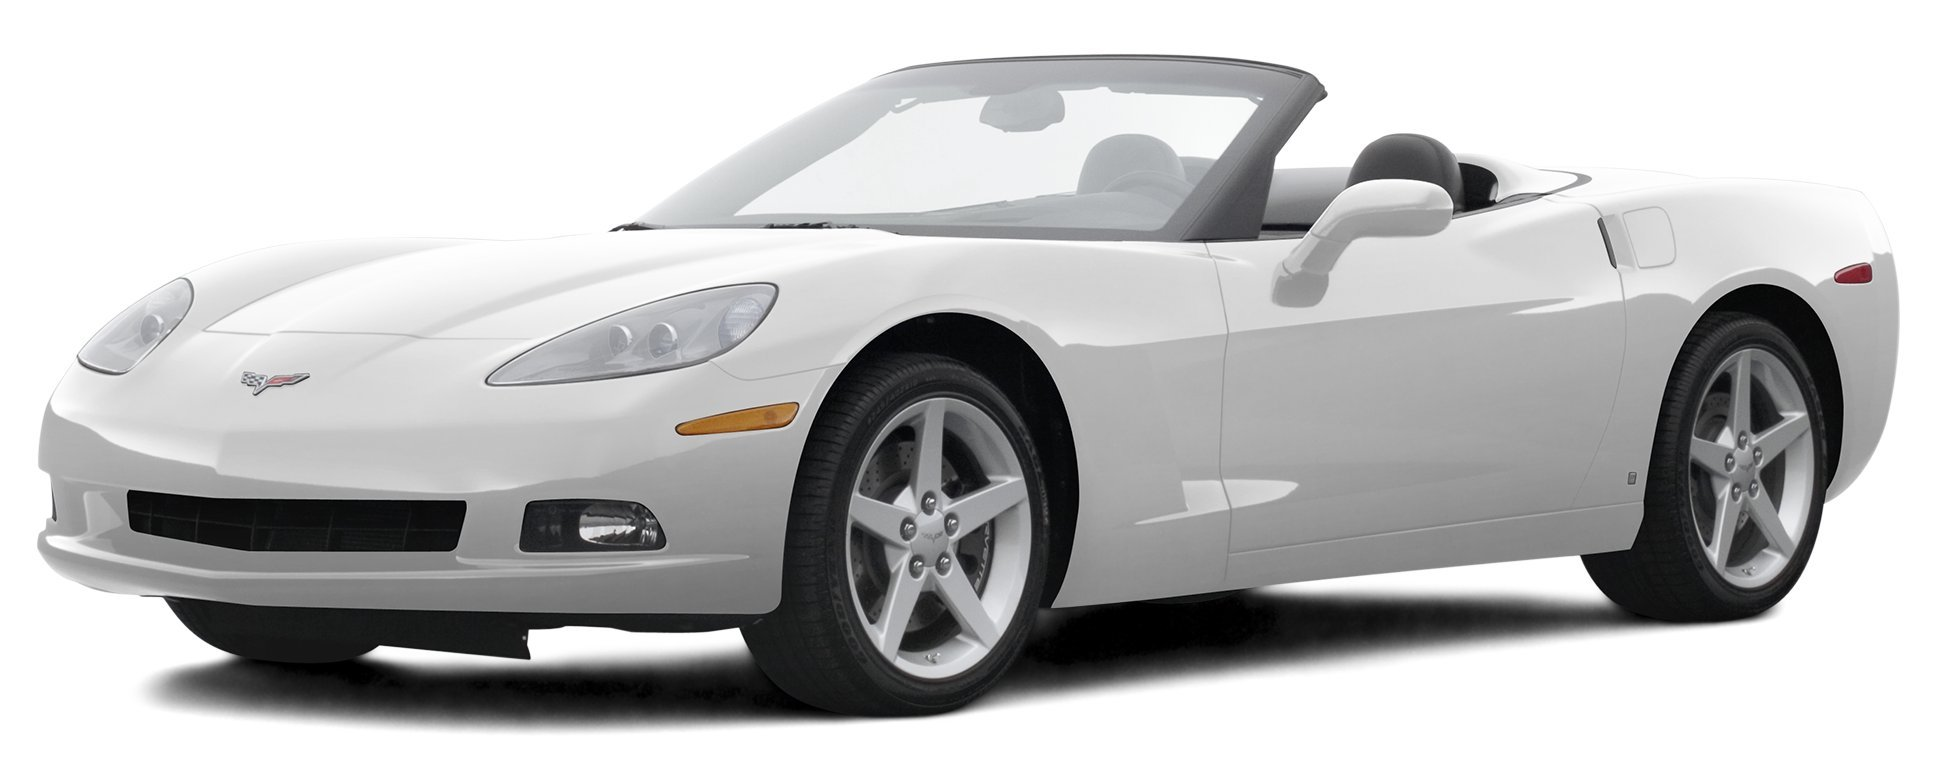 2007 Chevrolet Corvette Reviews Images And Specs Vehicles 1981 Door Lock Controls Parts Accessories For 2 Convertible